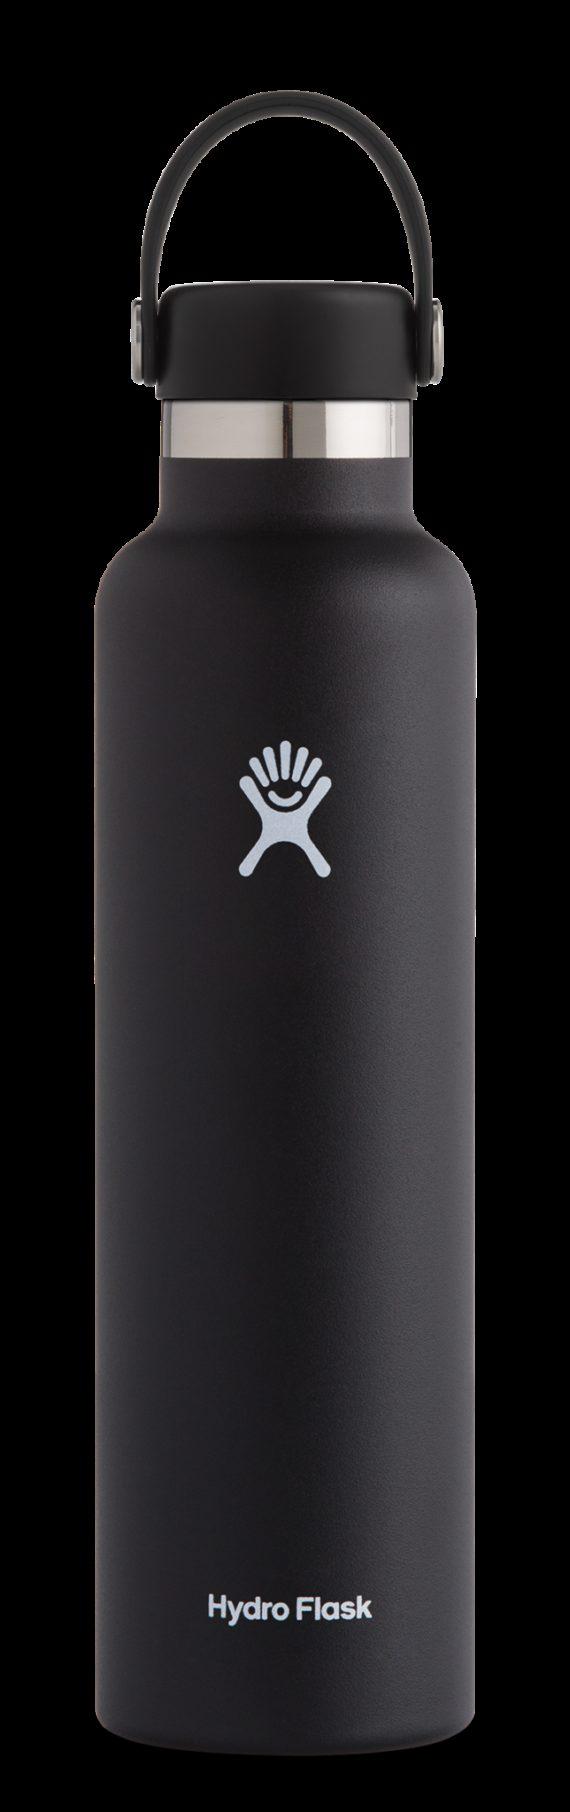 Hydro Flask 24 oz thermosfles 710ml Standard Mouth flex cap